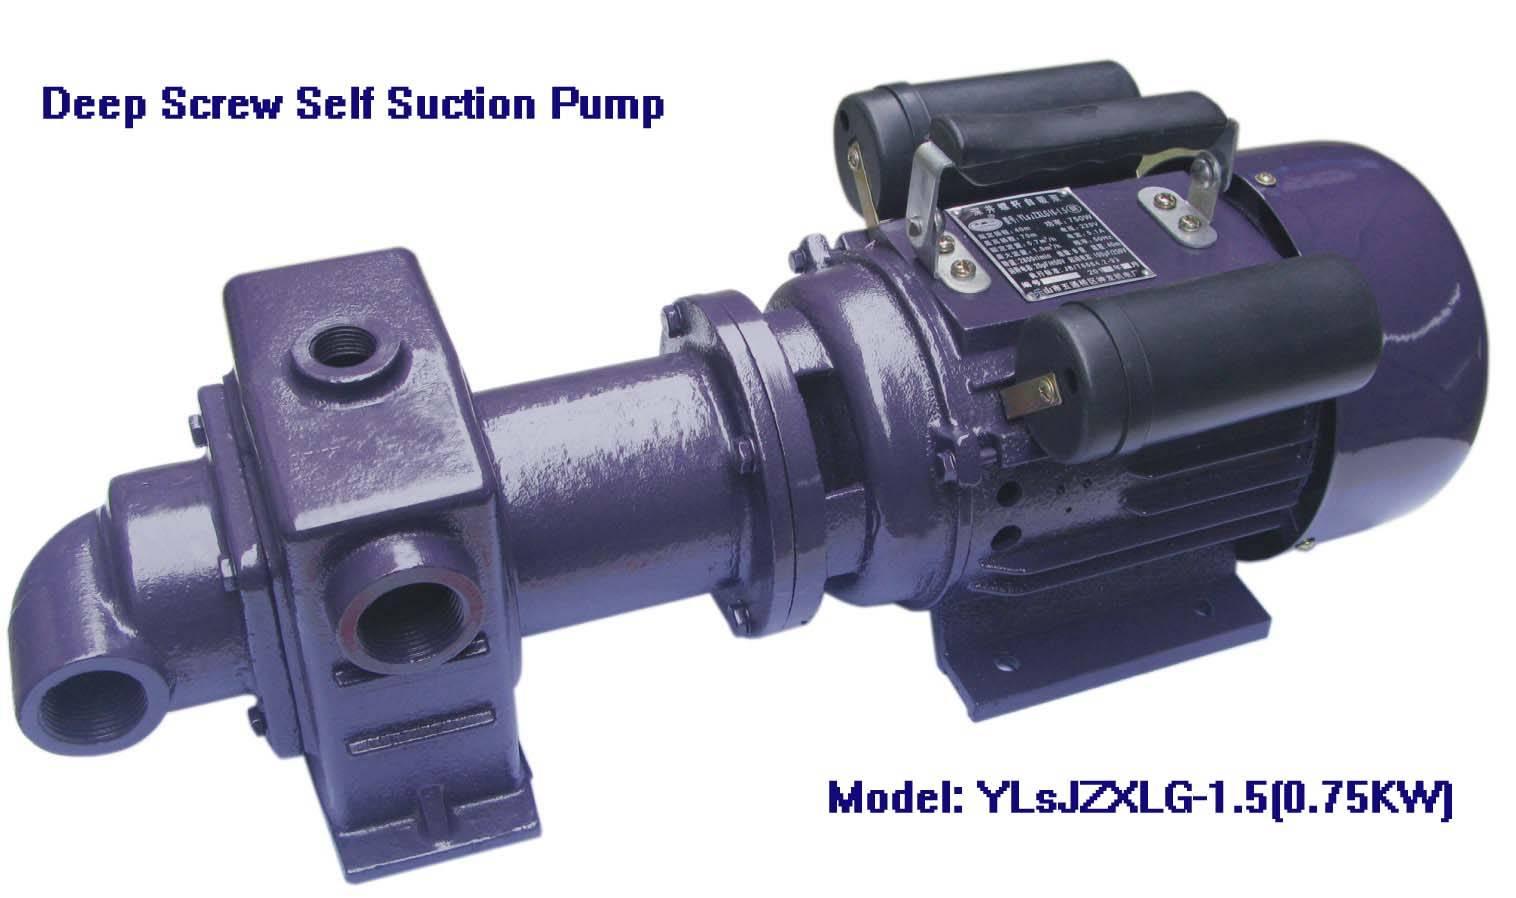 Electric Deep Screw Self Suction Pump-YLsJZXLG-1.5, 750W